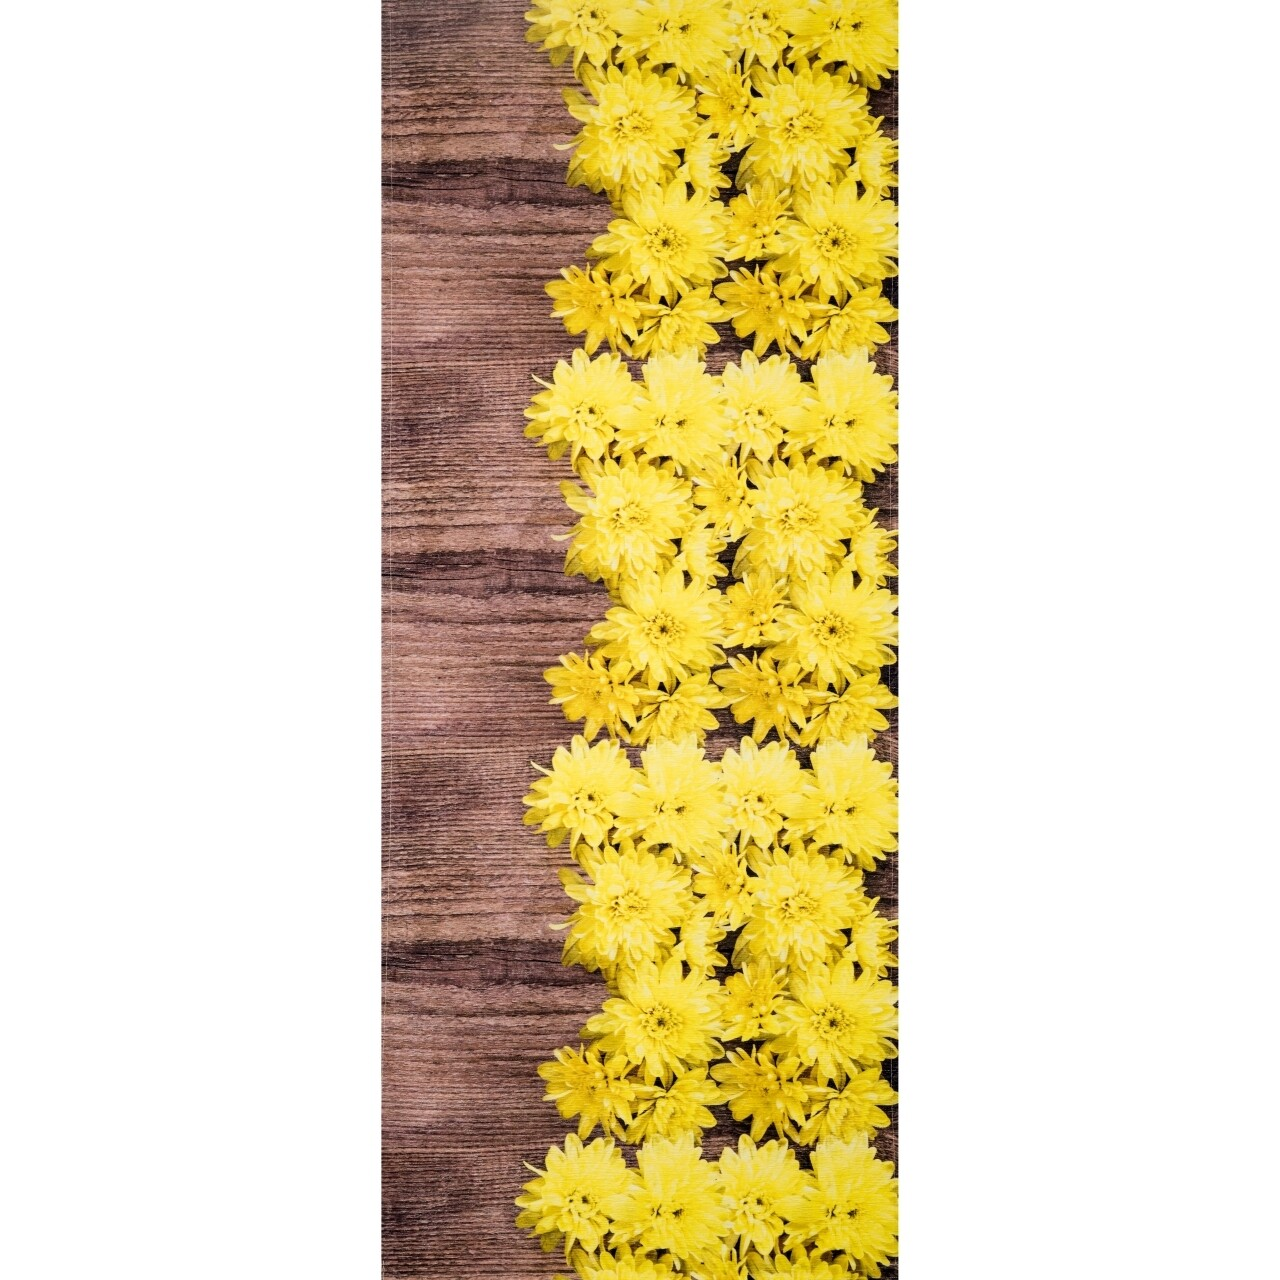 Covor rezistent Webtappeti DALIE CM 58x190 cm, galben/maro